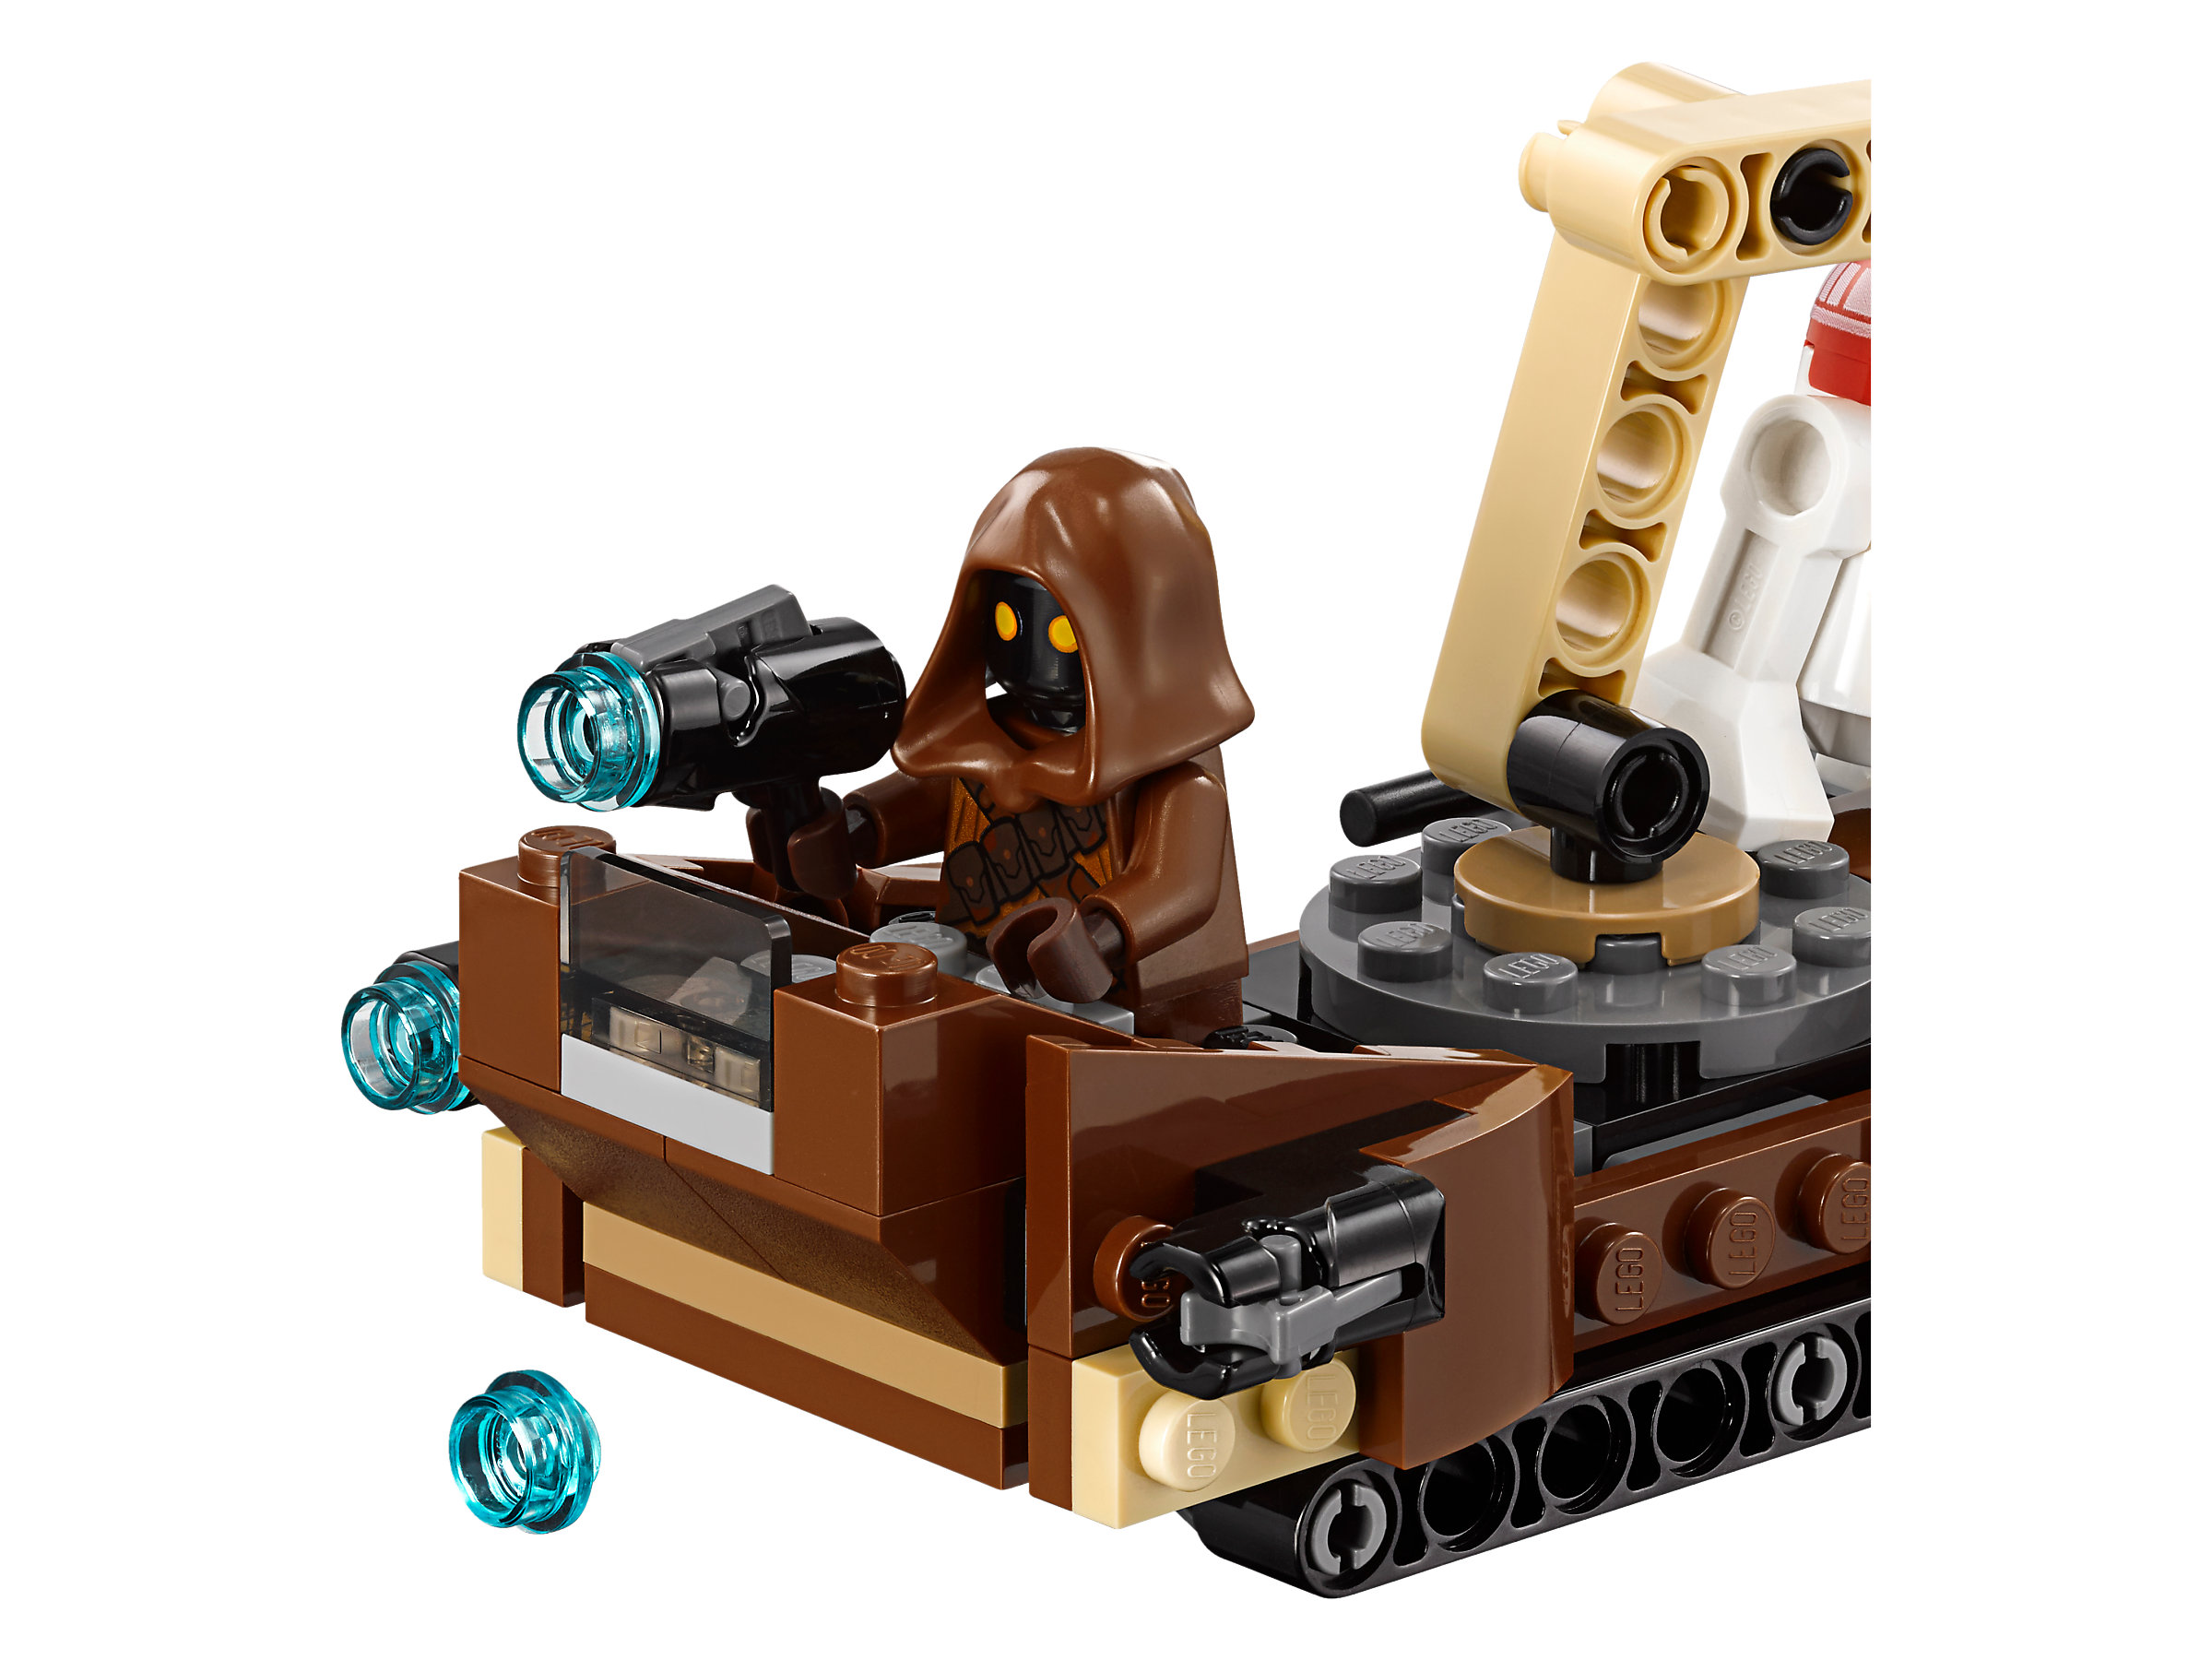 Lego Star Wars 75198 Tatooine Battle Pack Jawa Droid Sealed Bags No Box New